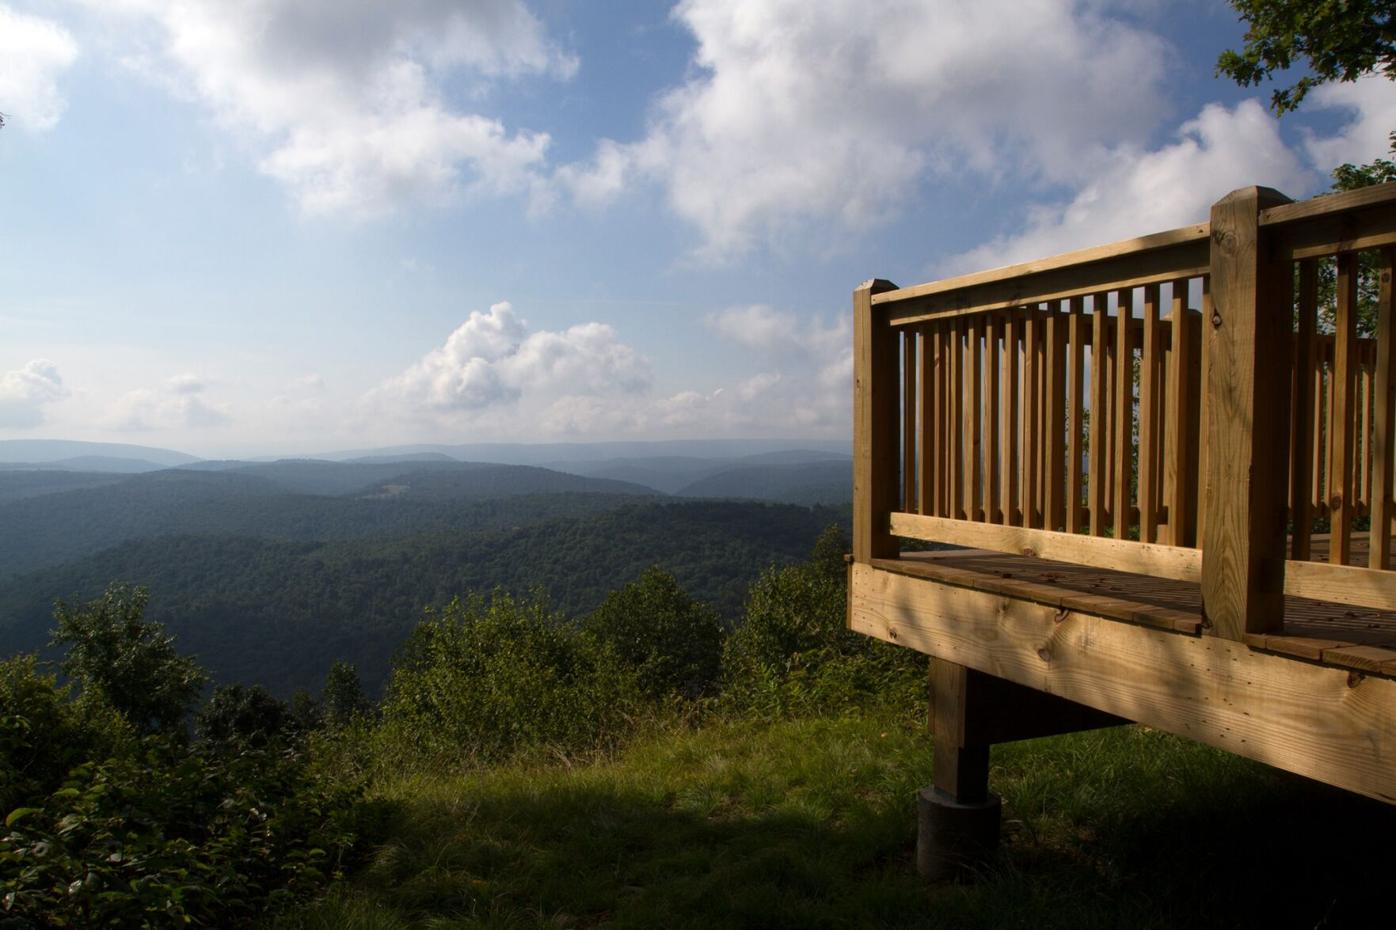 Meadow Mountain overlook